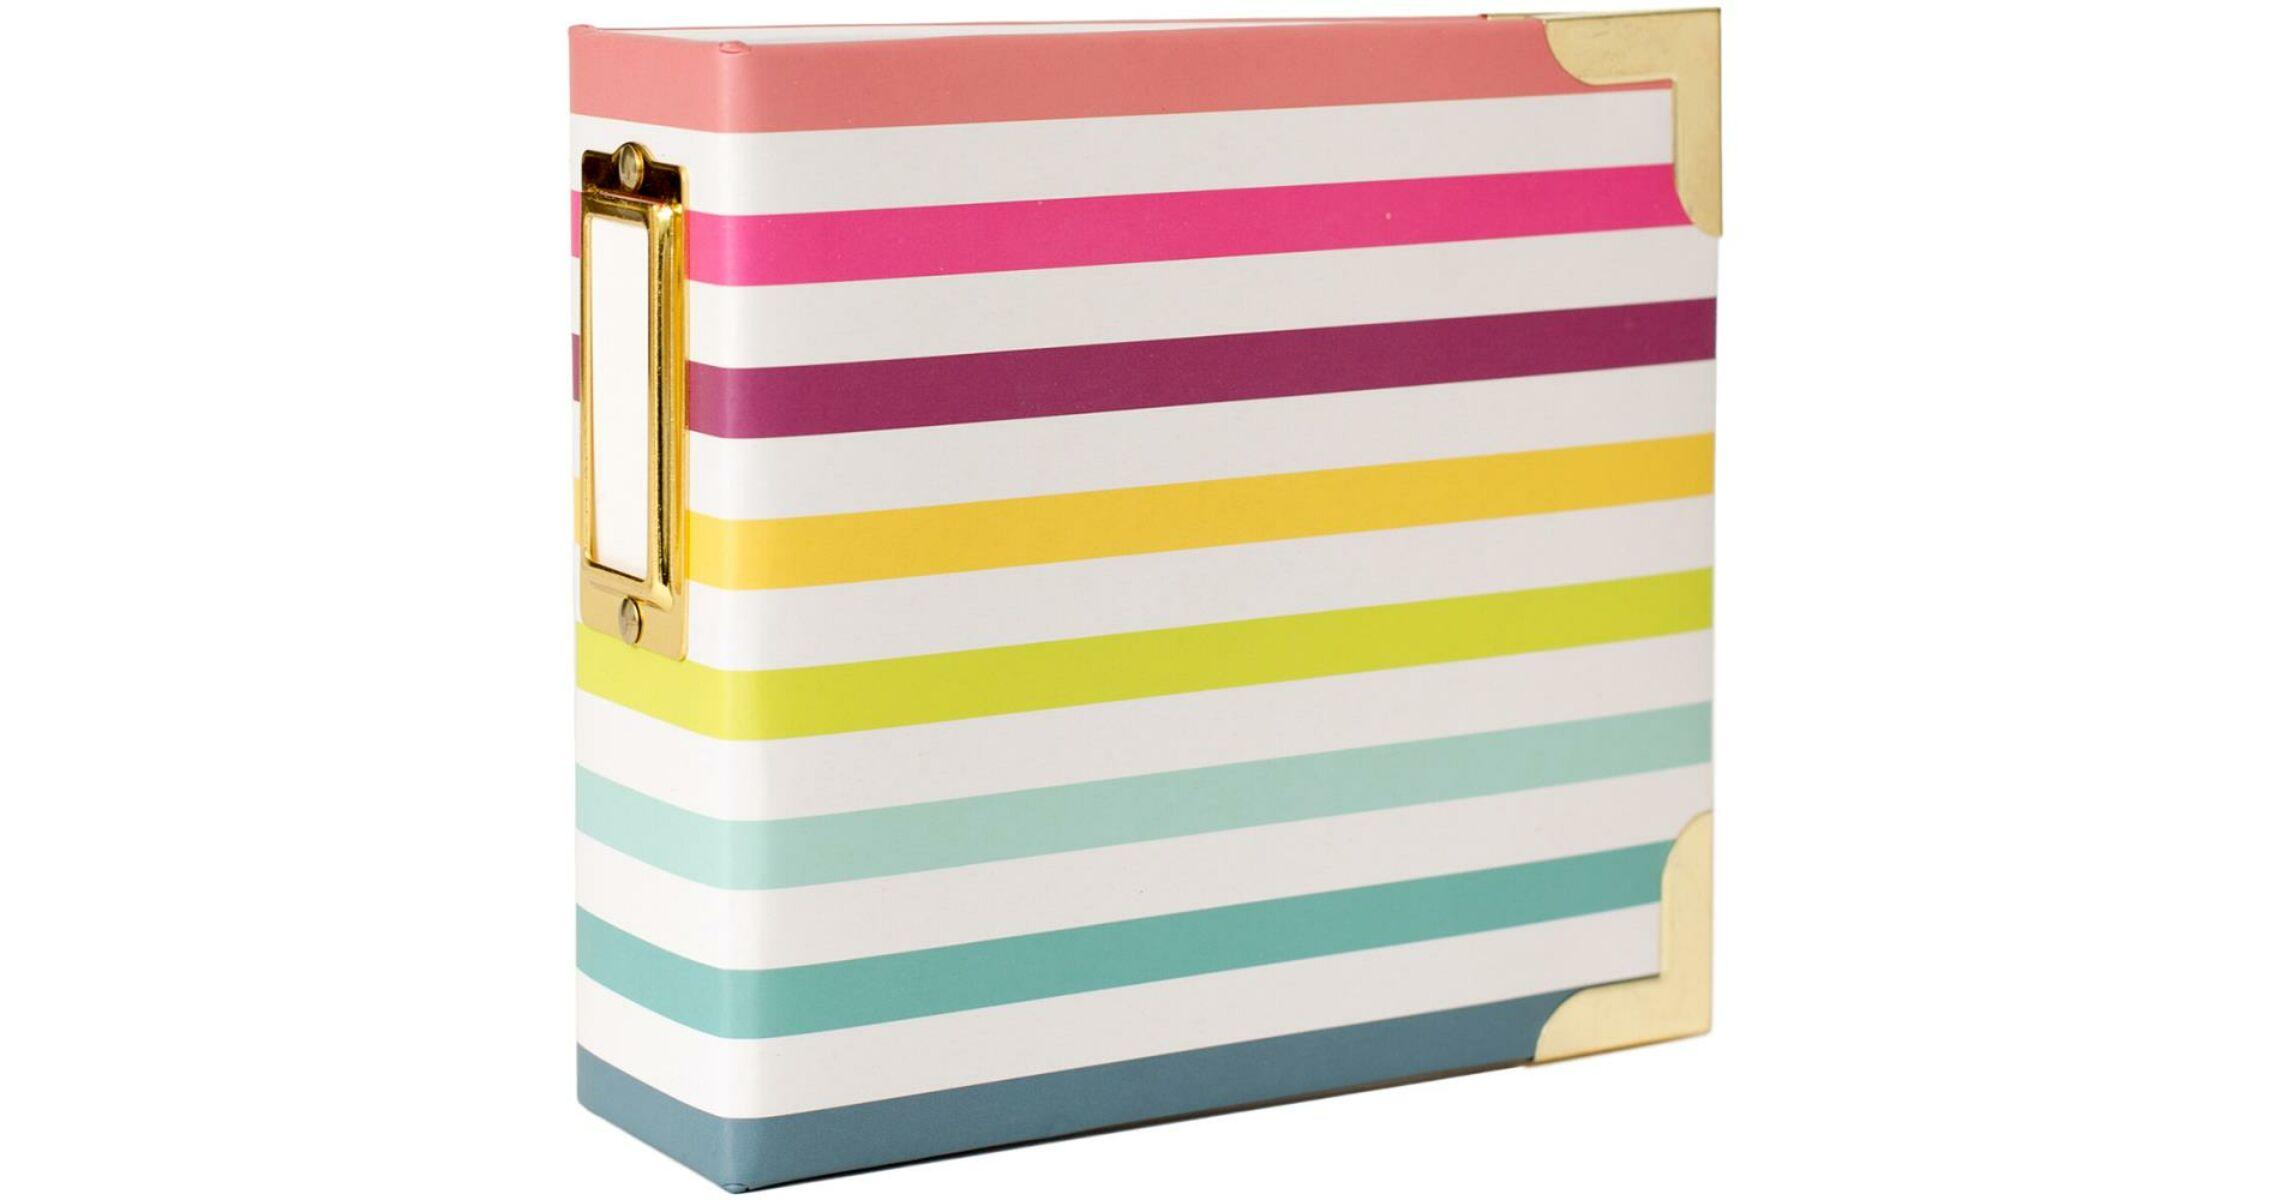 4x4 Insta Album Becky Higgins Project Life 4x4 Insta Album Stripe Pink And Paper Scrapbooking Shop